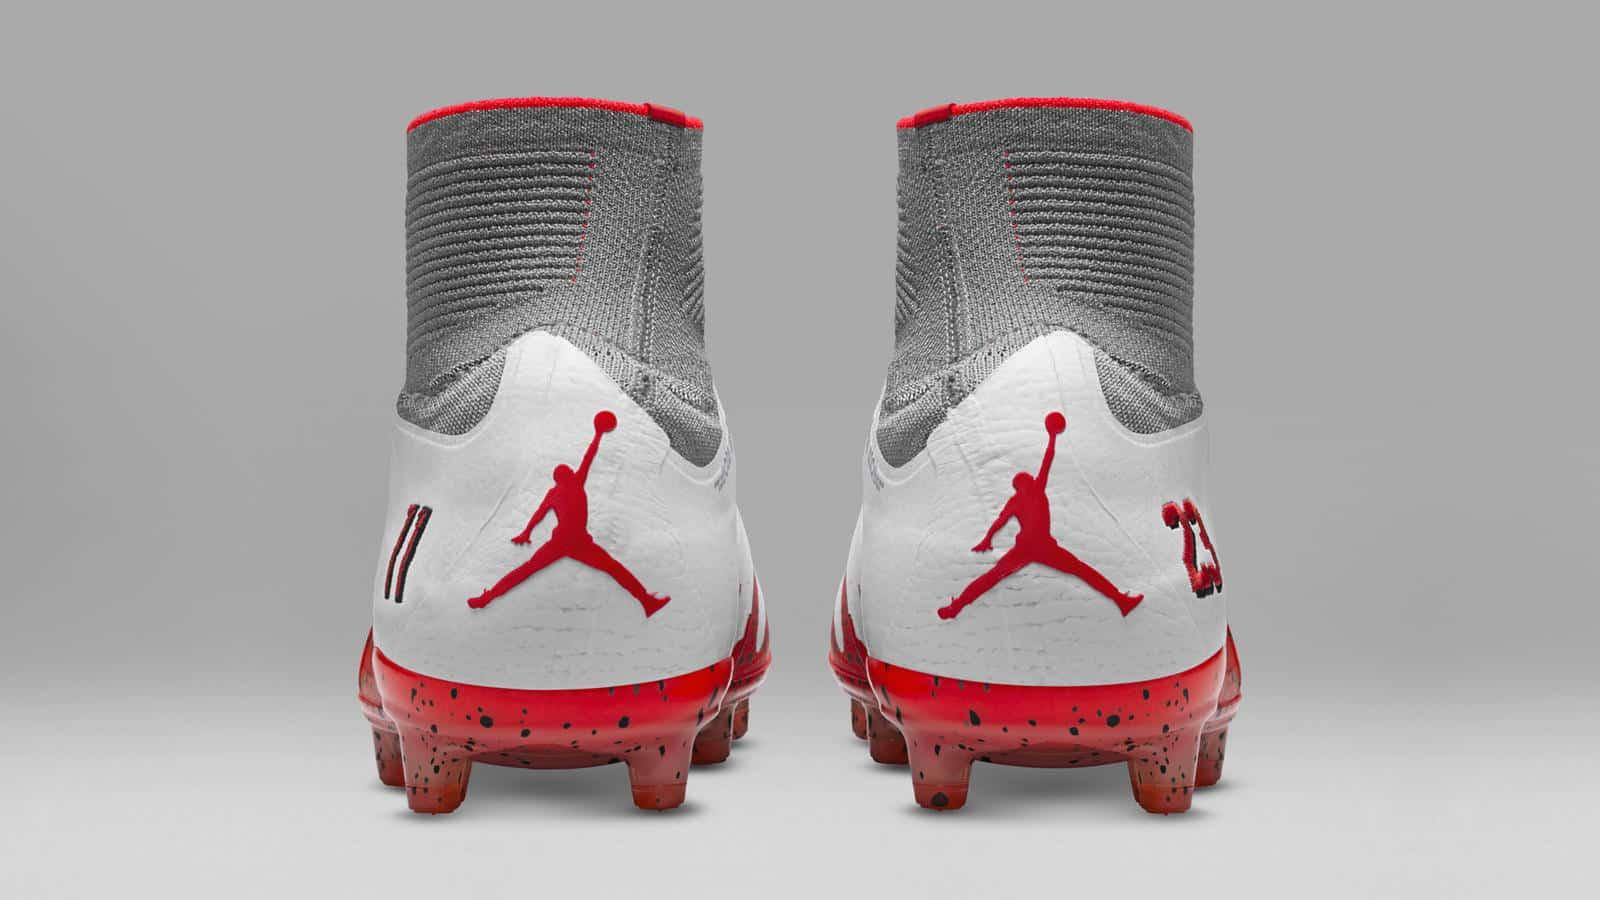 chaussure-foot-nike-hypervenom-neymar-jordan-blanc-octobre-2016-5